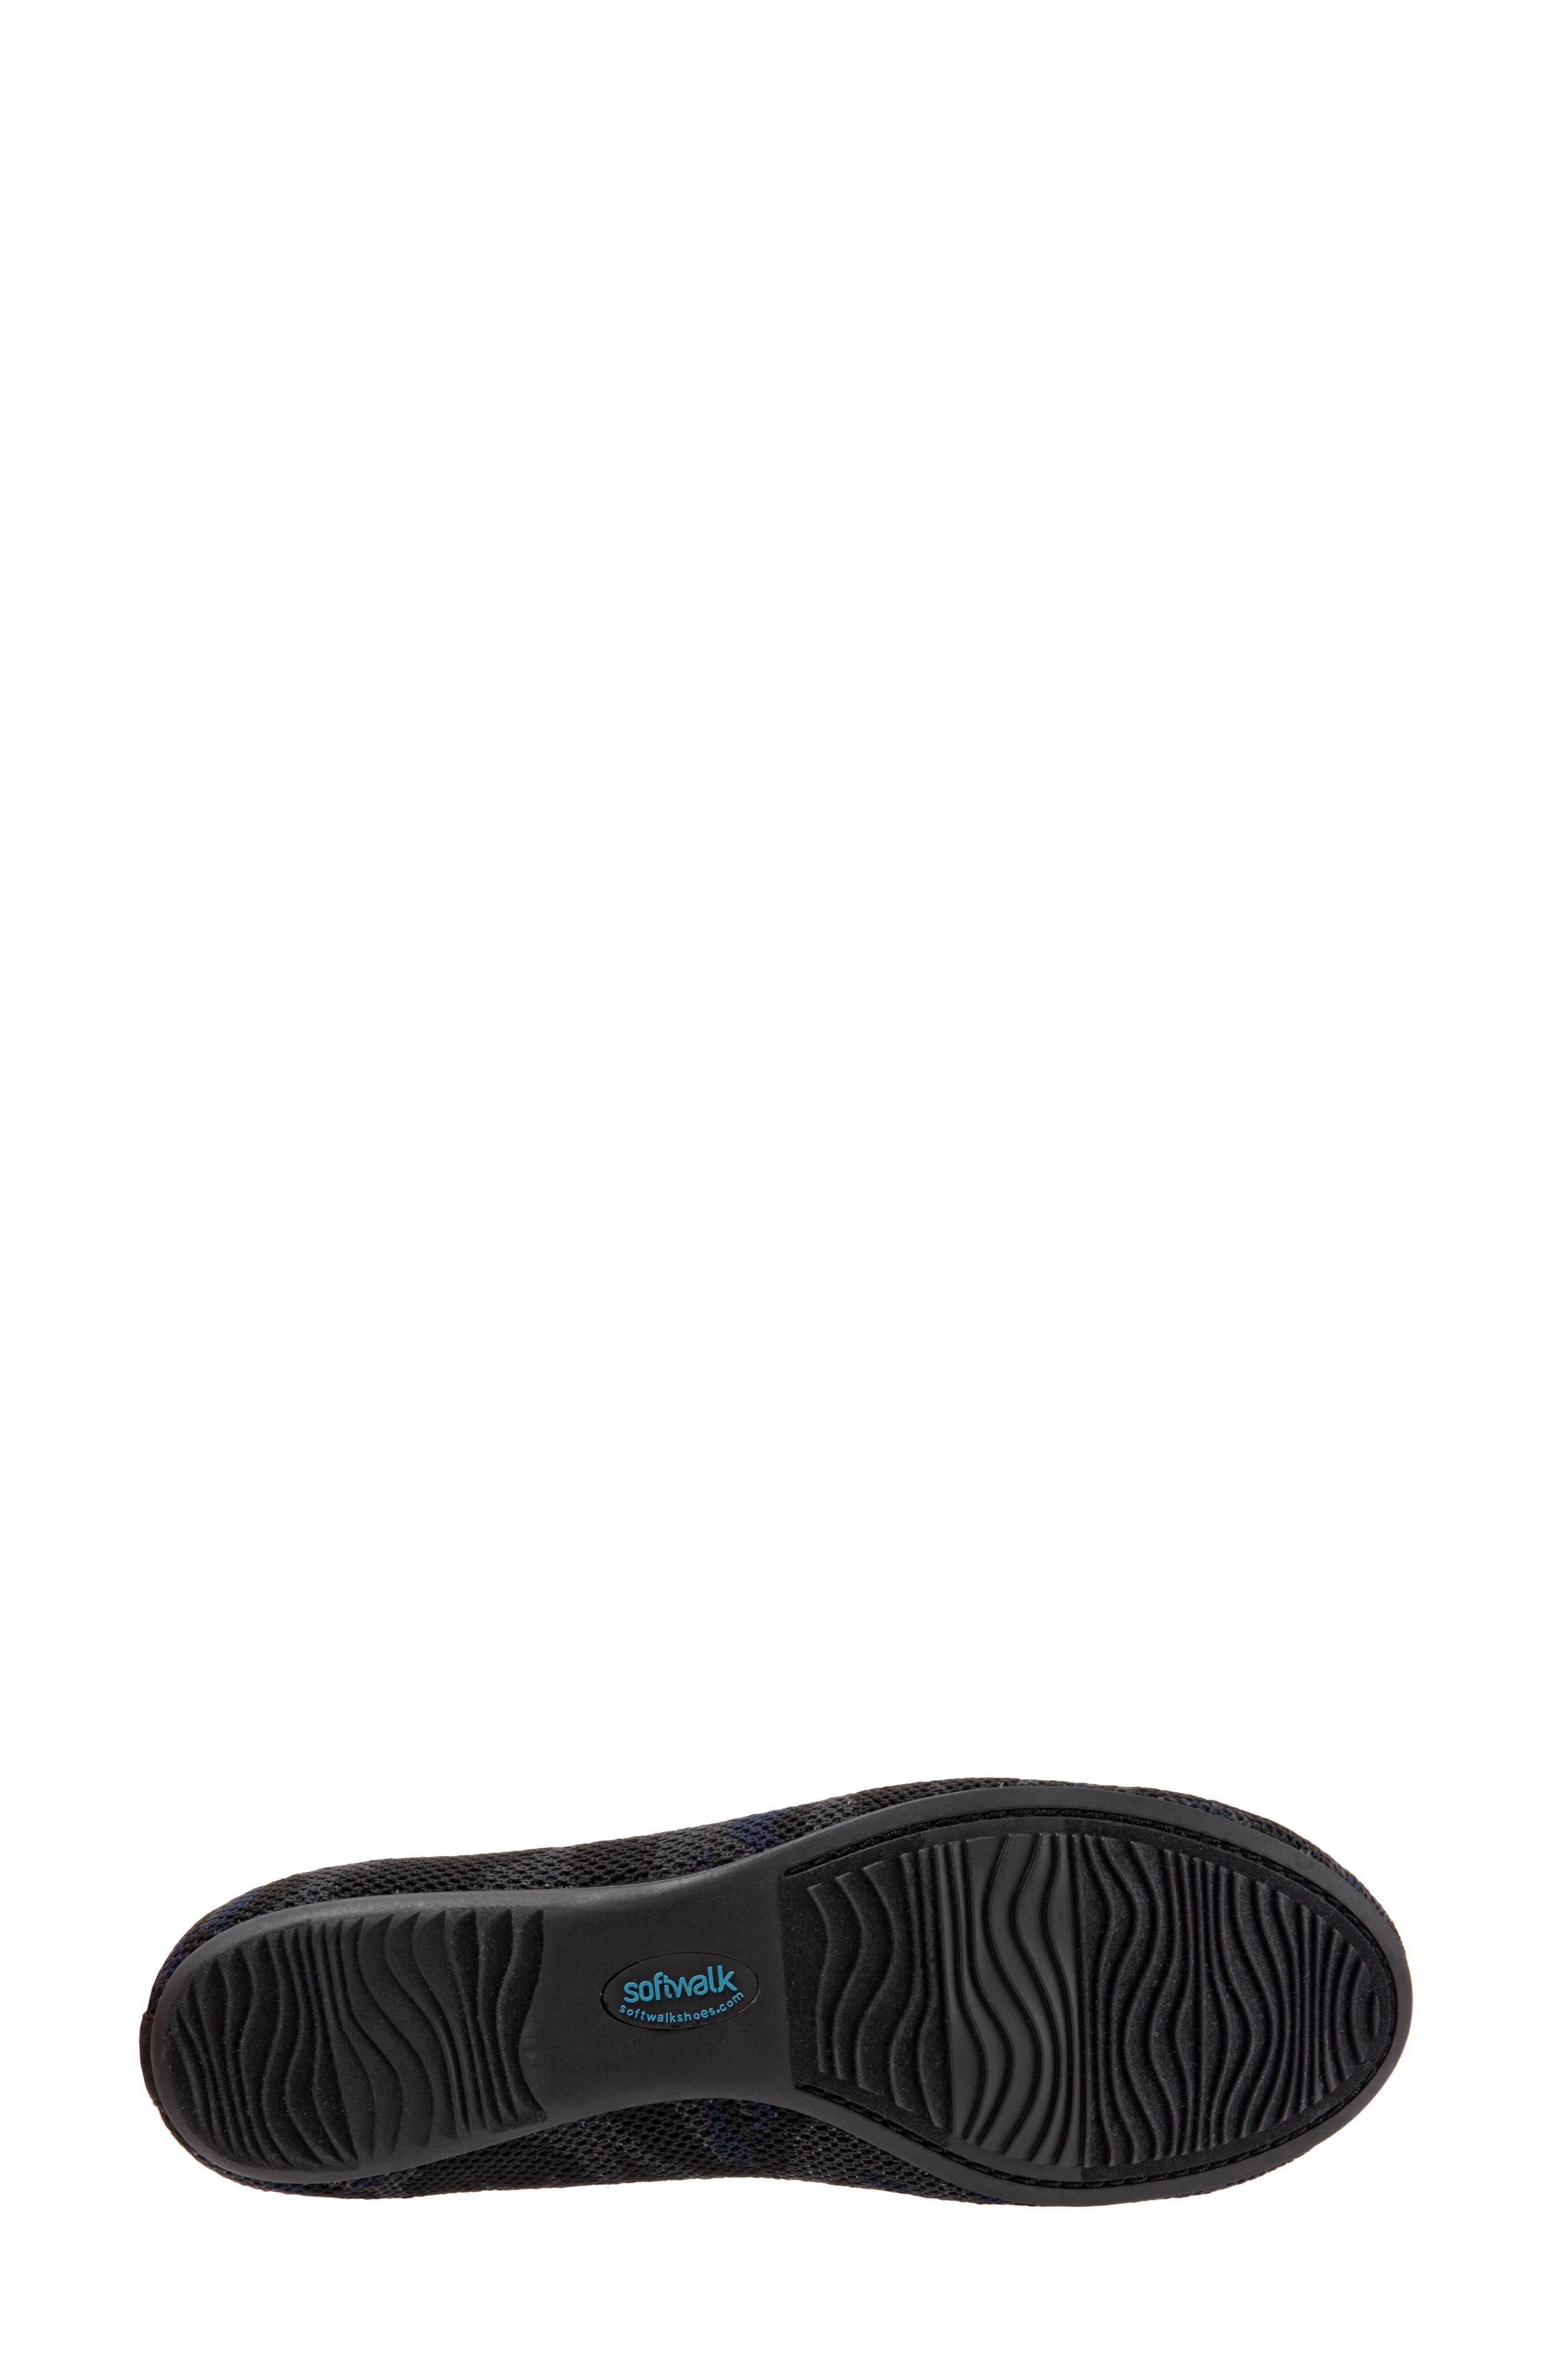 SOFTWALK<SUP>®</SUP>, Sicily Knit Flat, Alternate thumbnail 6, color, BLACK/ GREY FABRIC